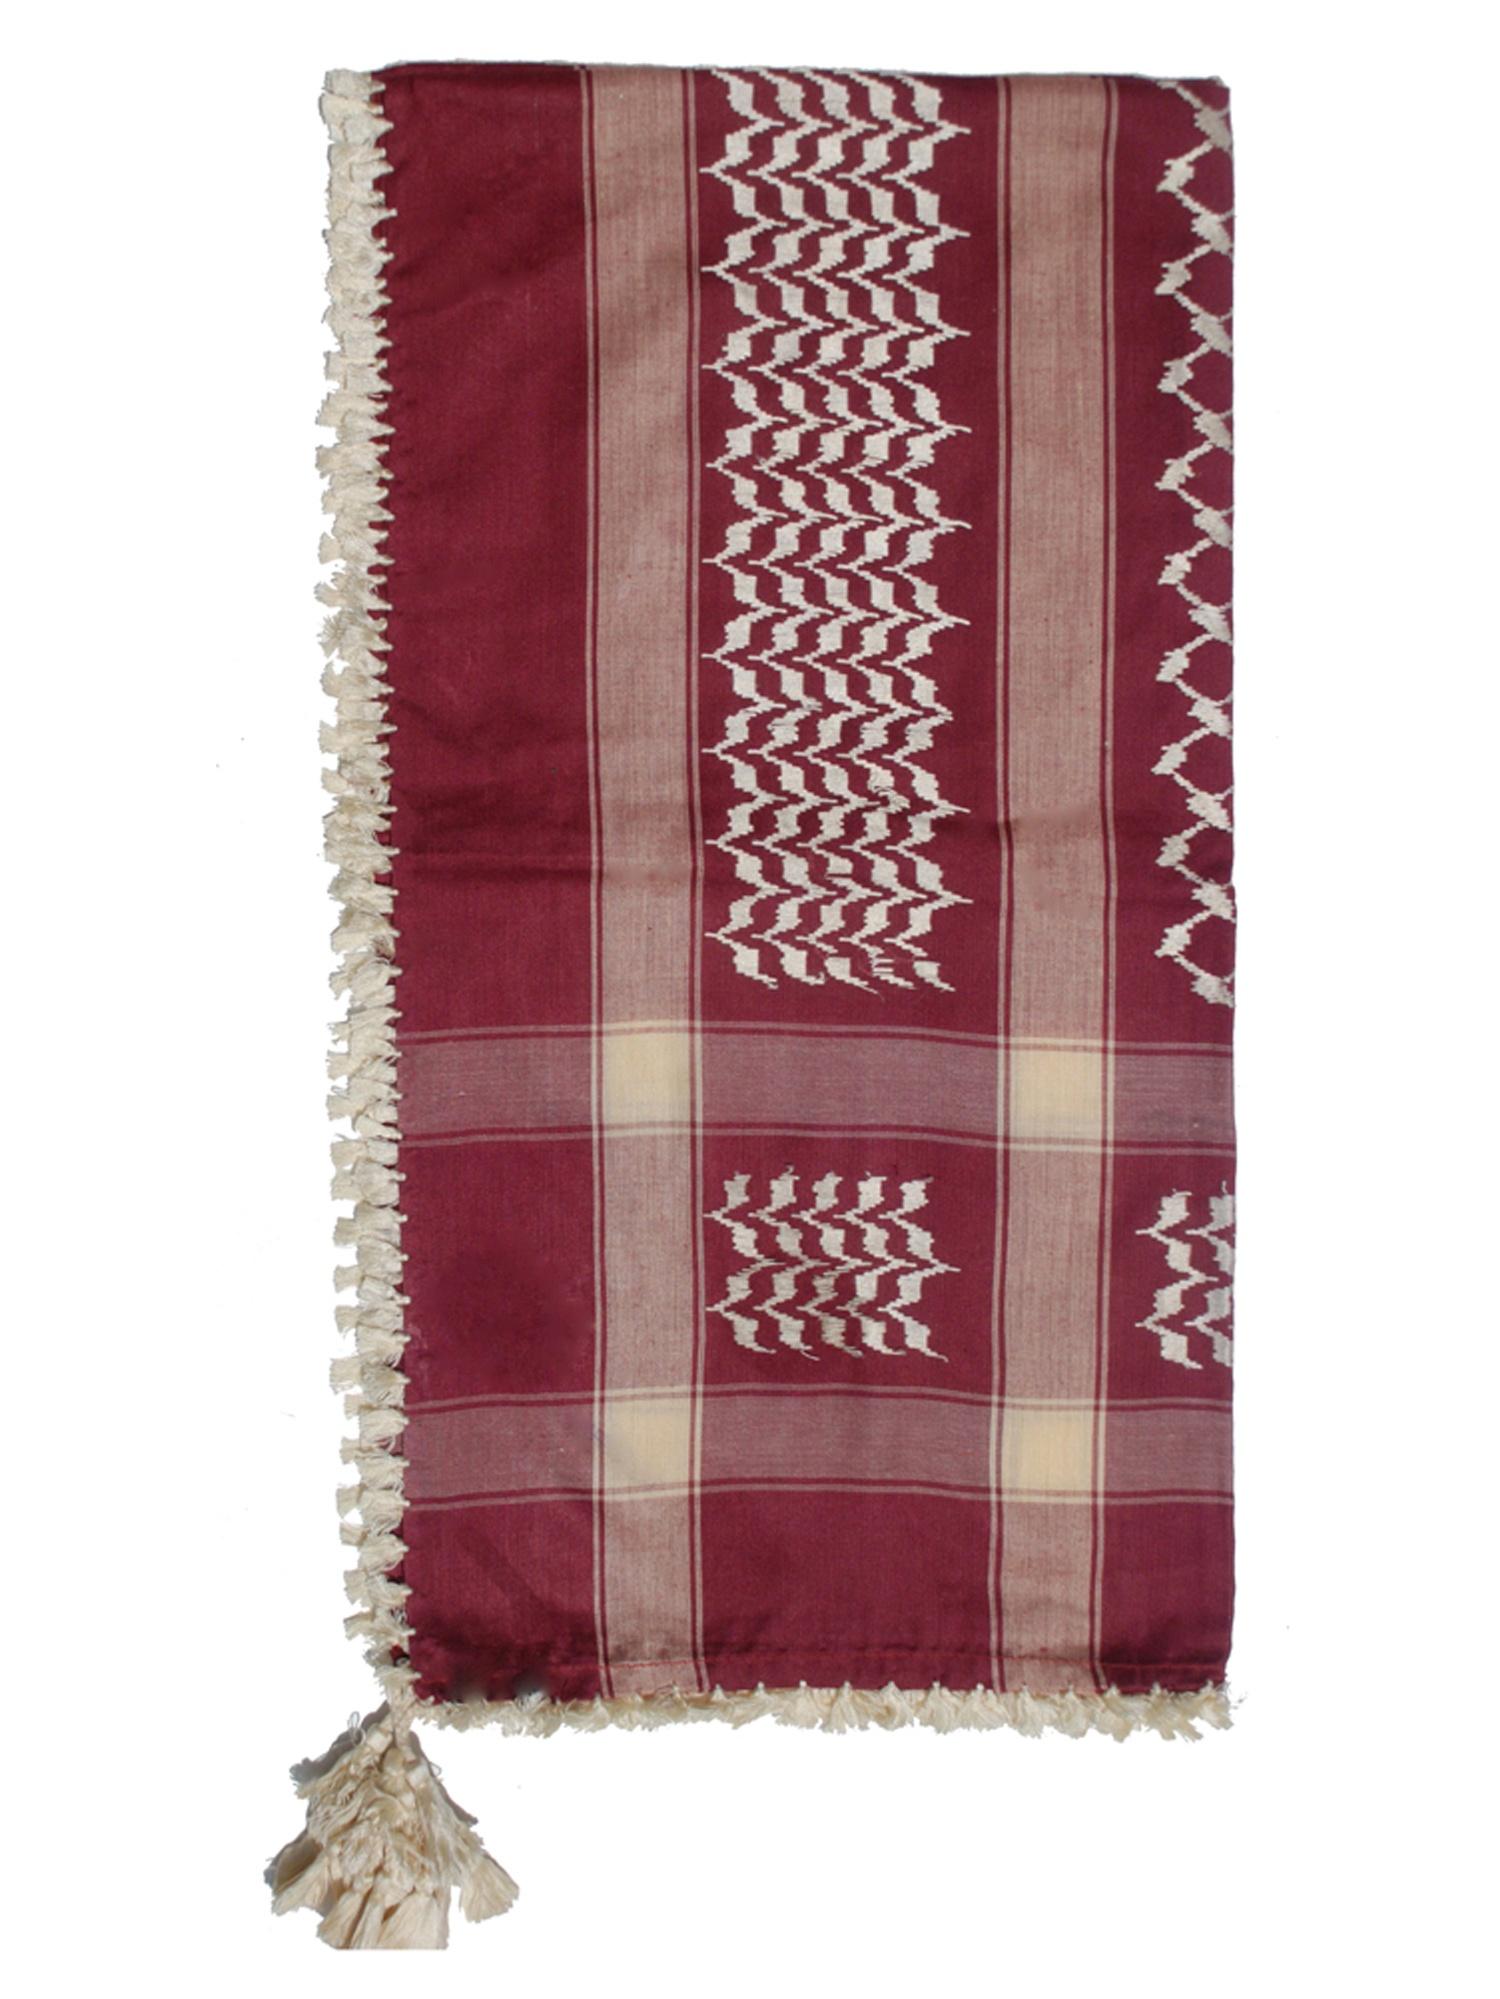 MuslimClothing® Maroon & White Keffiyeh Men's Muslim Arafat Scarf Shawl Turban Sorban Shawl Turban Sorban